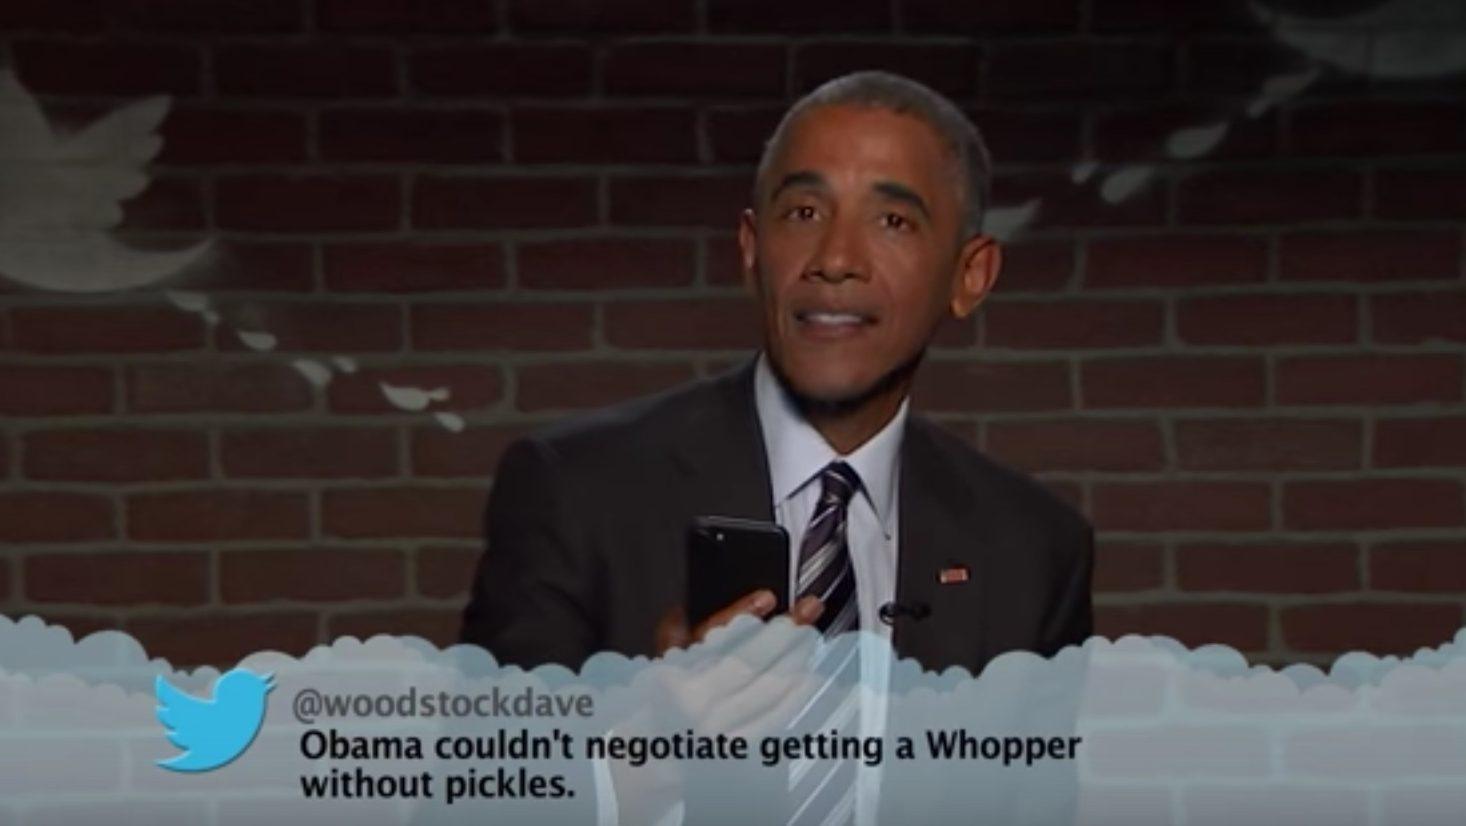 President Obama Reads Trump's 'Mean Tweet' on 'Jimmy Kimmel Live'